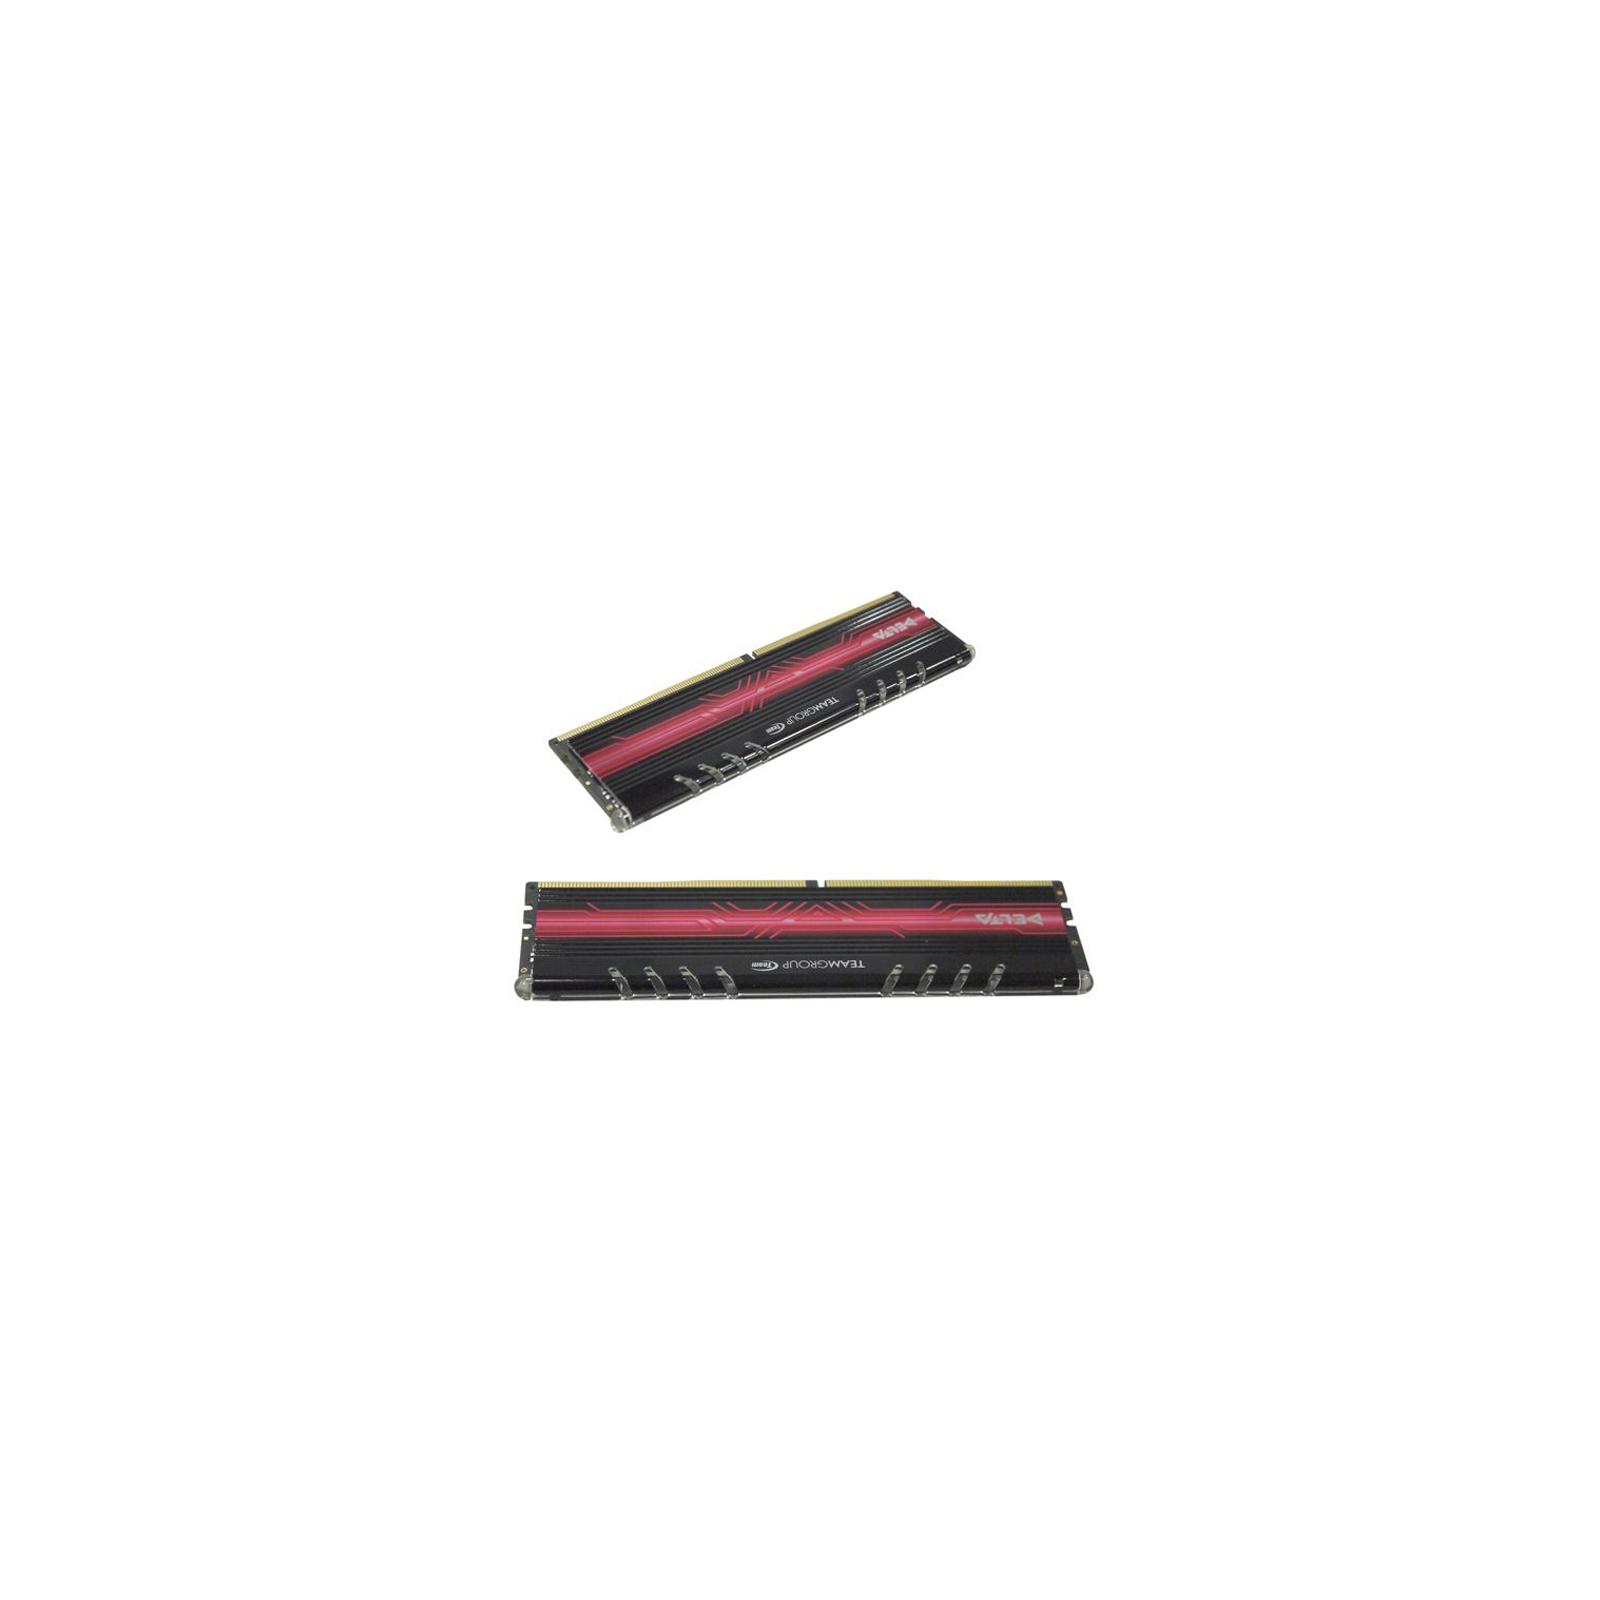 Модуль памяти для компьютера DDR4 16GB (2x8GB) 2400 MHz Delta Red LED Team (TDTRD416G2400HC15ADC01) изображение 2